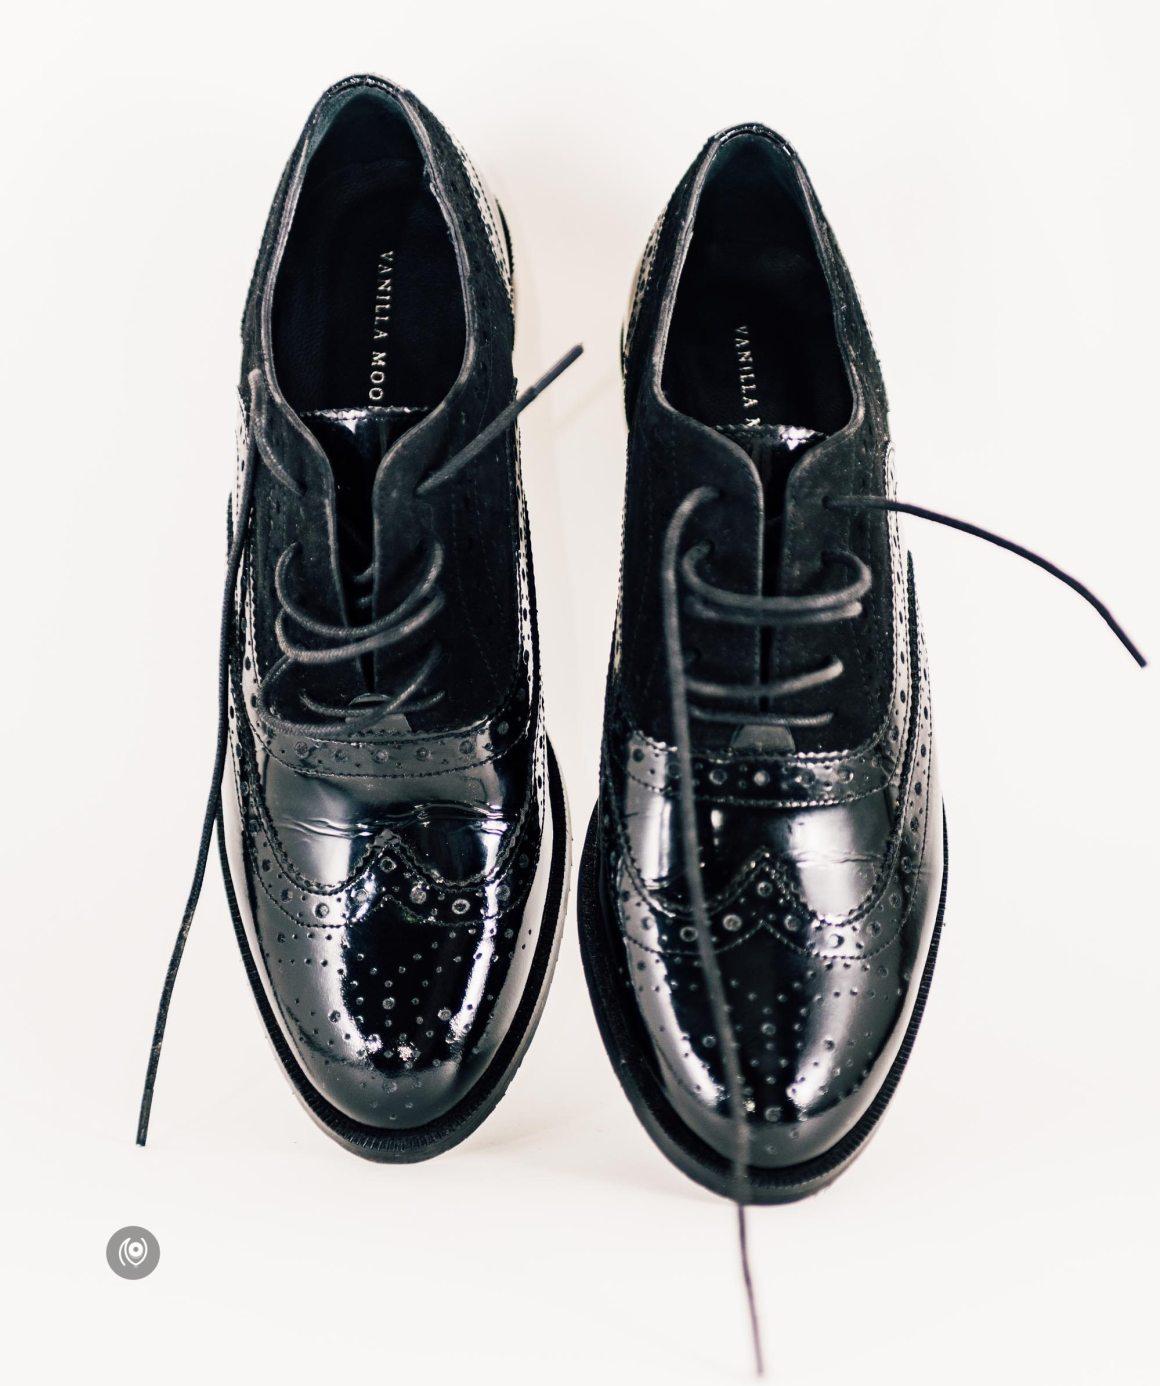 Vanilla Moon Shoes, Palma Black Leather Suede, Brogues, Footwear, #MadeInIndia Naina.co, Naina Redhu, Luxury Photographer, Lifestyle Photographer, Luxury Blogger, Lifestyle Blogger, #EyesForFashion, Experience Collector